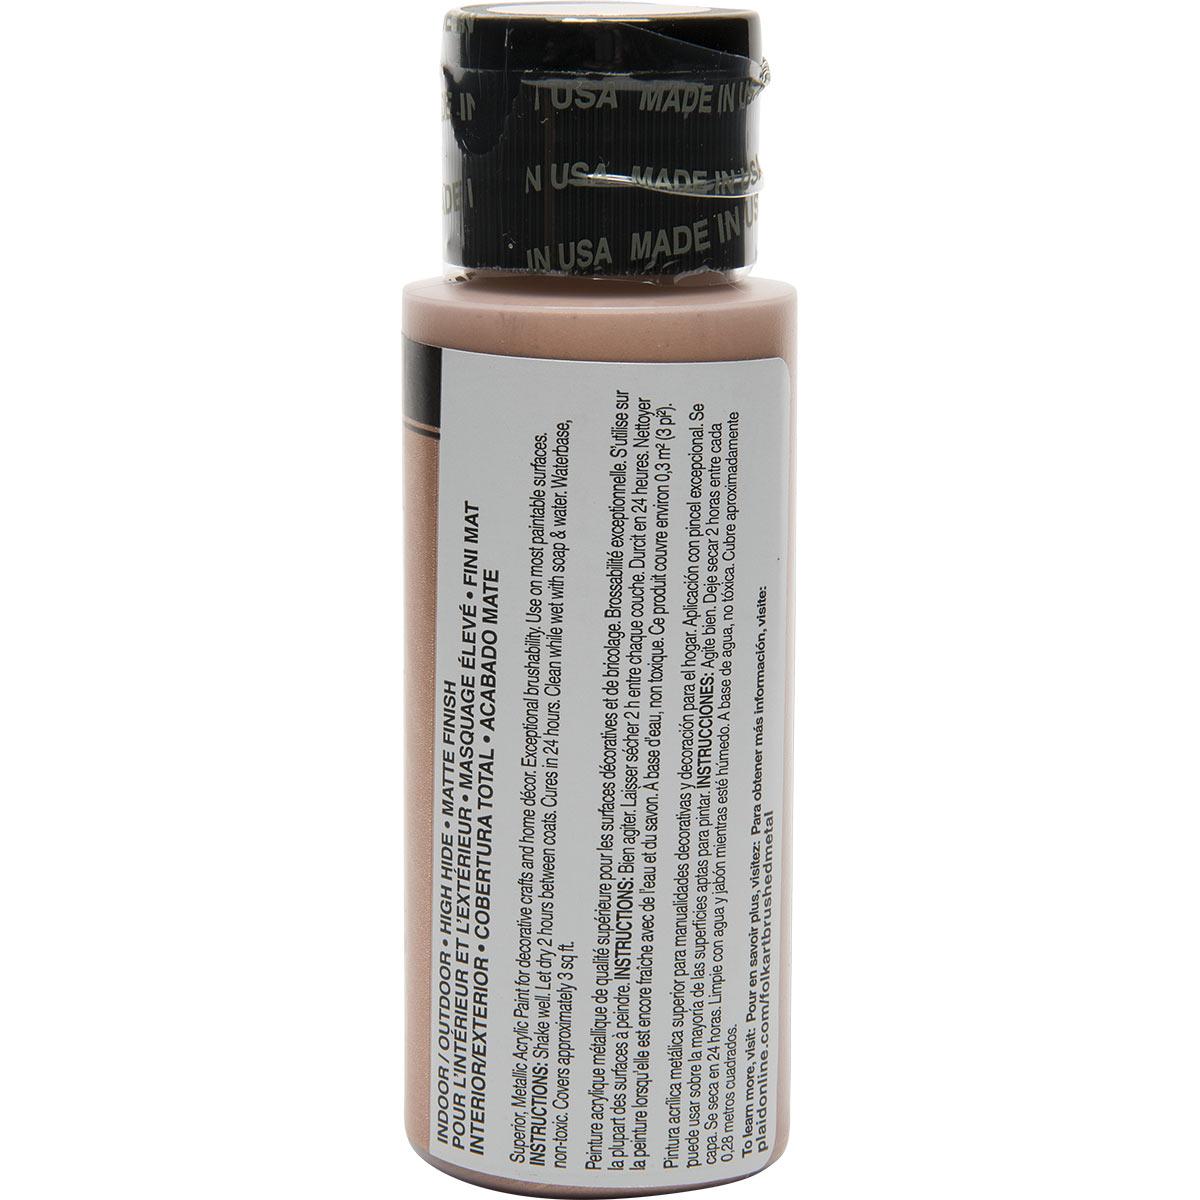 FolkArt ® Brushed Metal™ Acrylic Paint - Rose Gold, 2 oz. - 5124